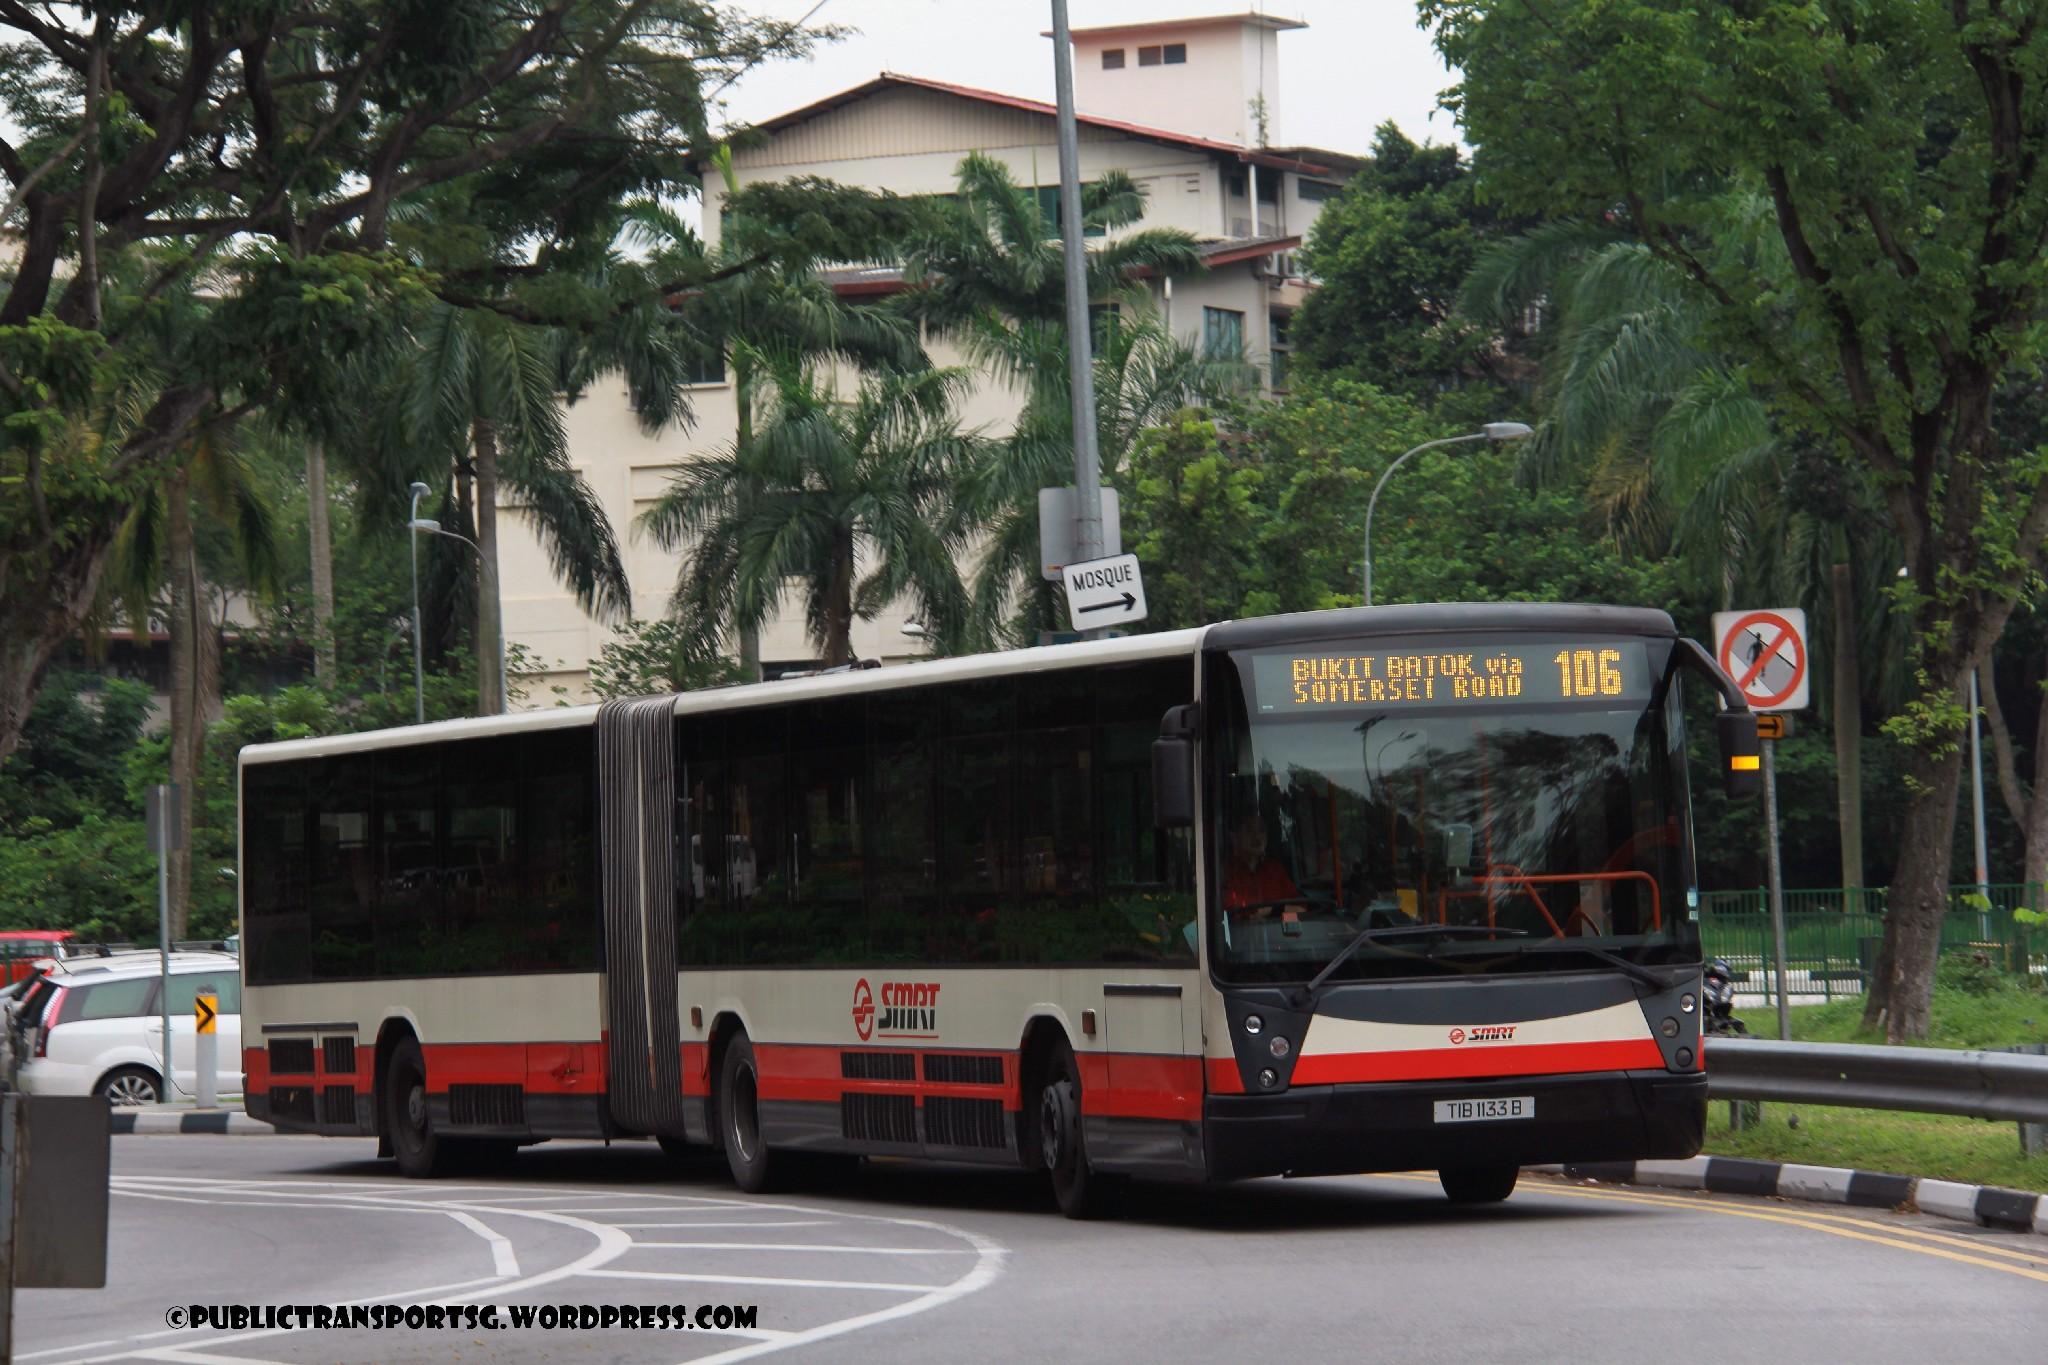 TIB1133B - Service 106 (Gorba imotion)